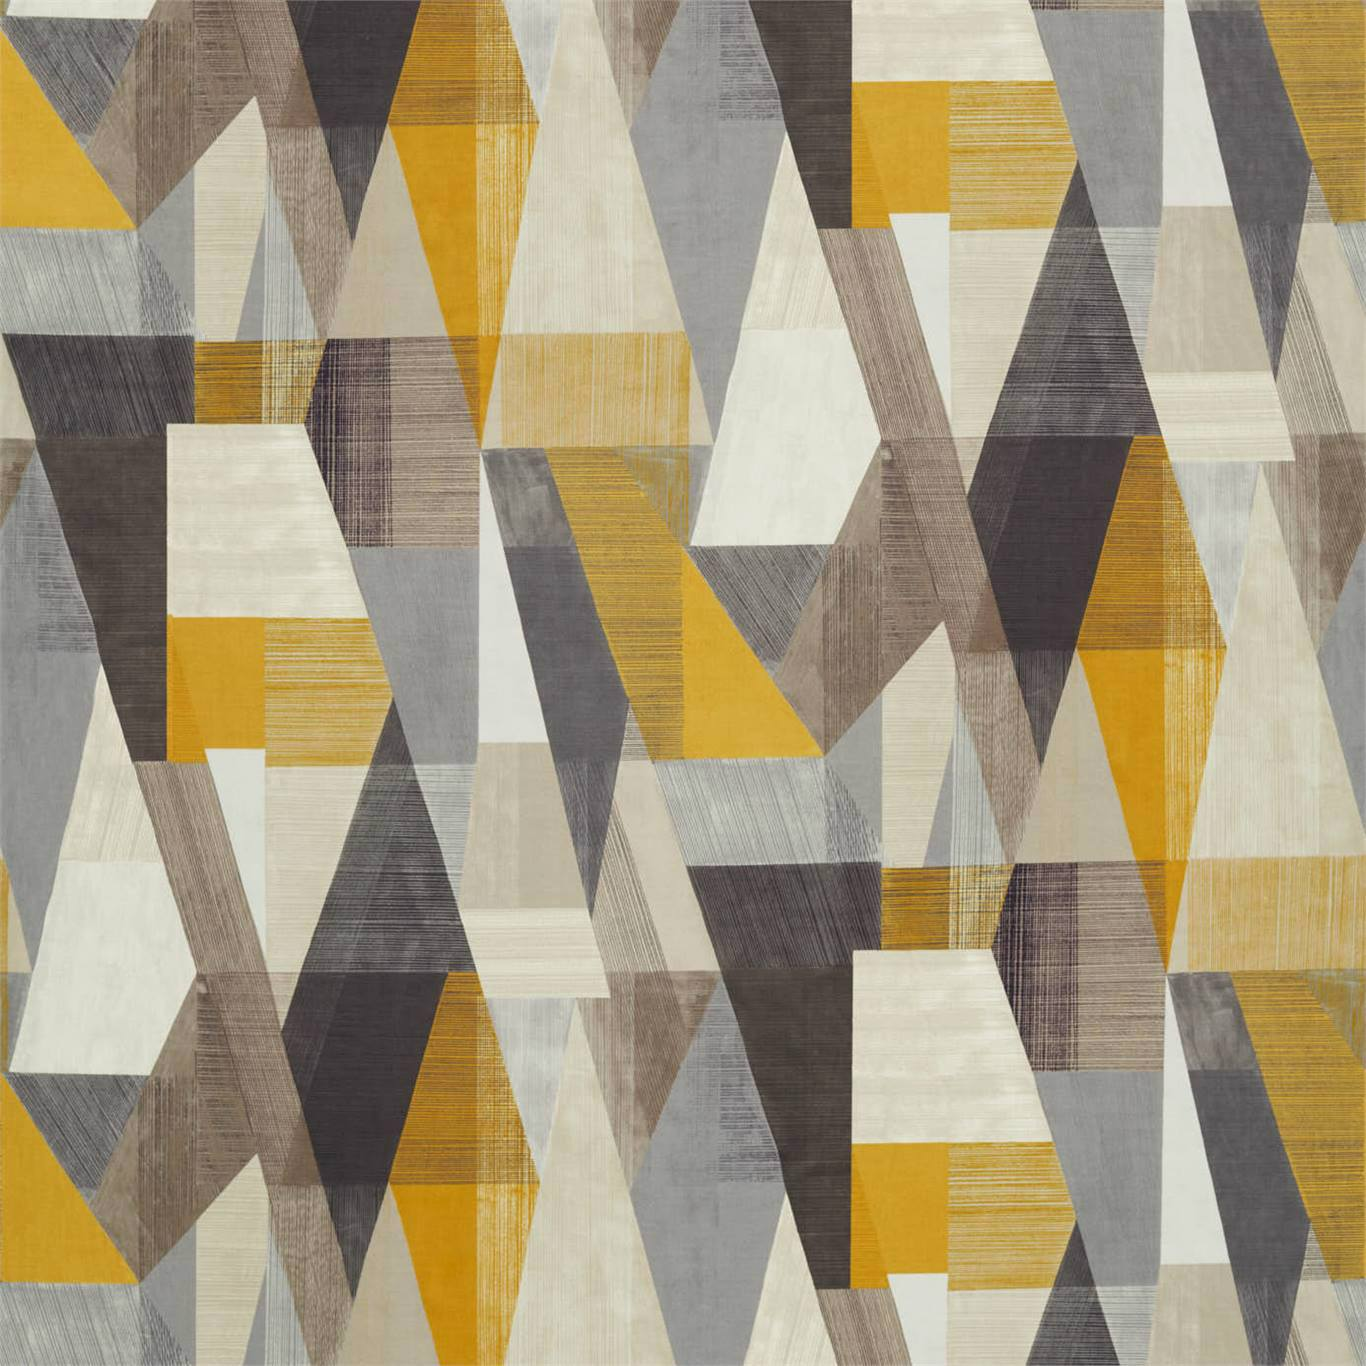 Pythagorum by HAR